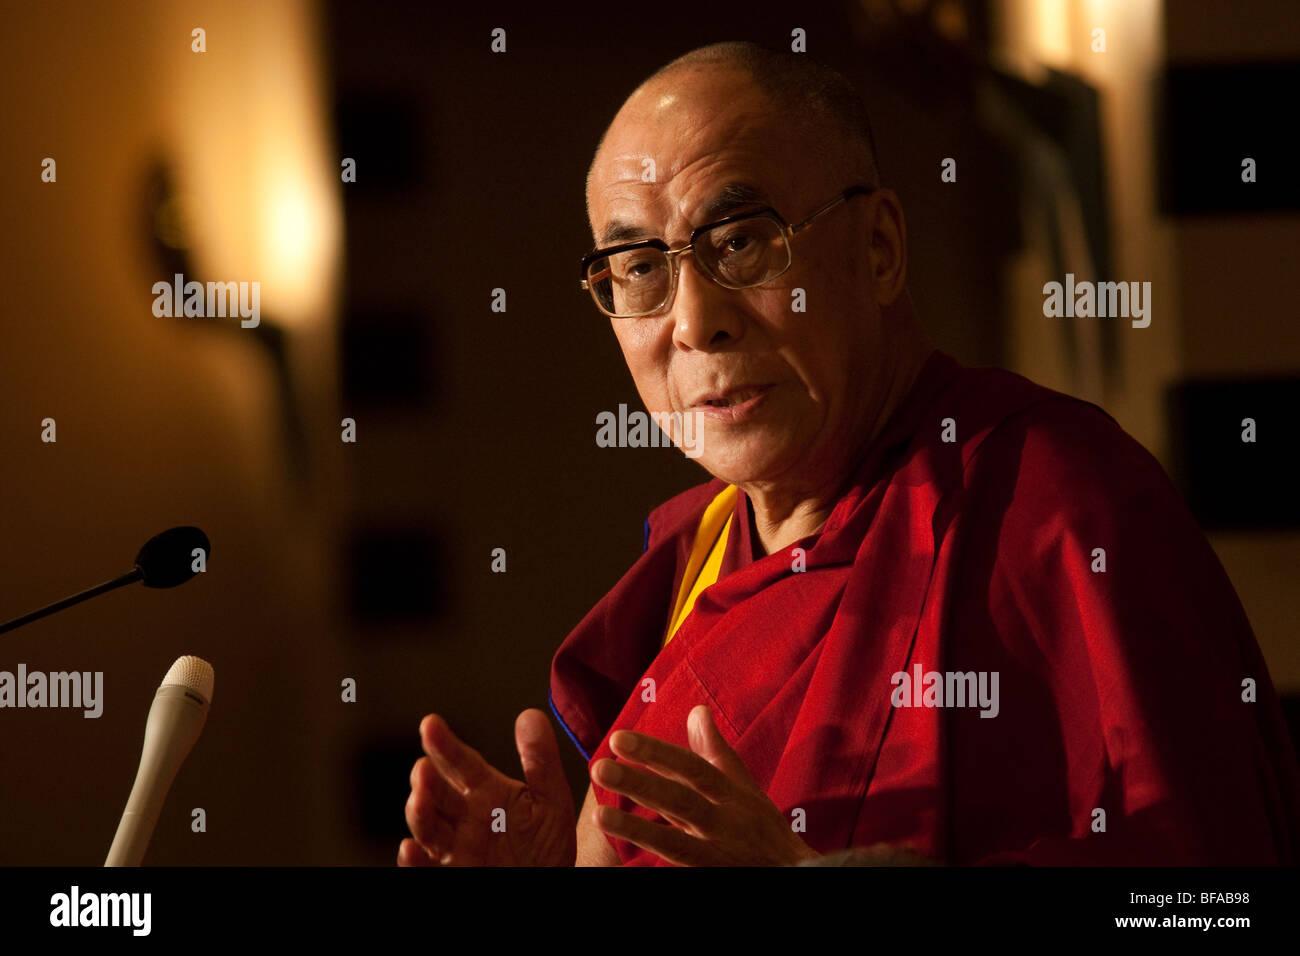 Dalai Lama Tenzin Gyatso, speaking at a function. - Stock Image